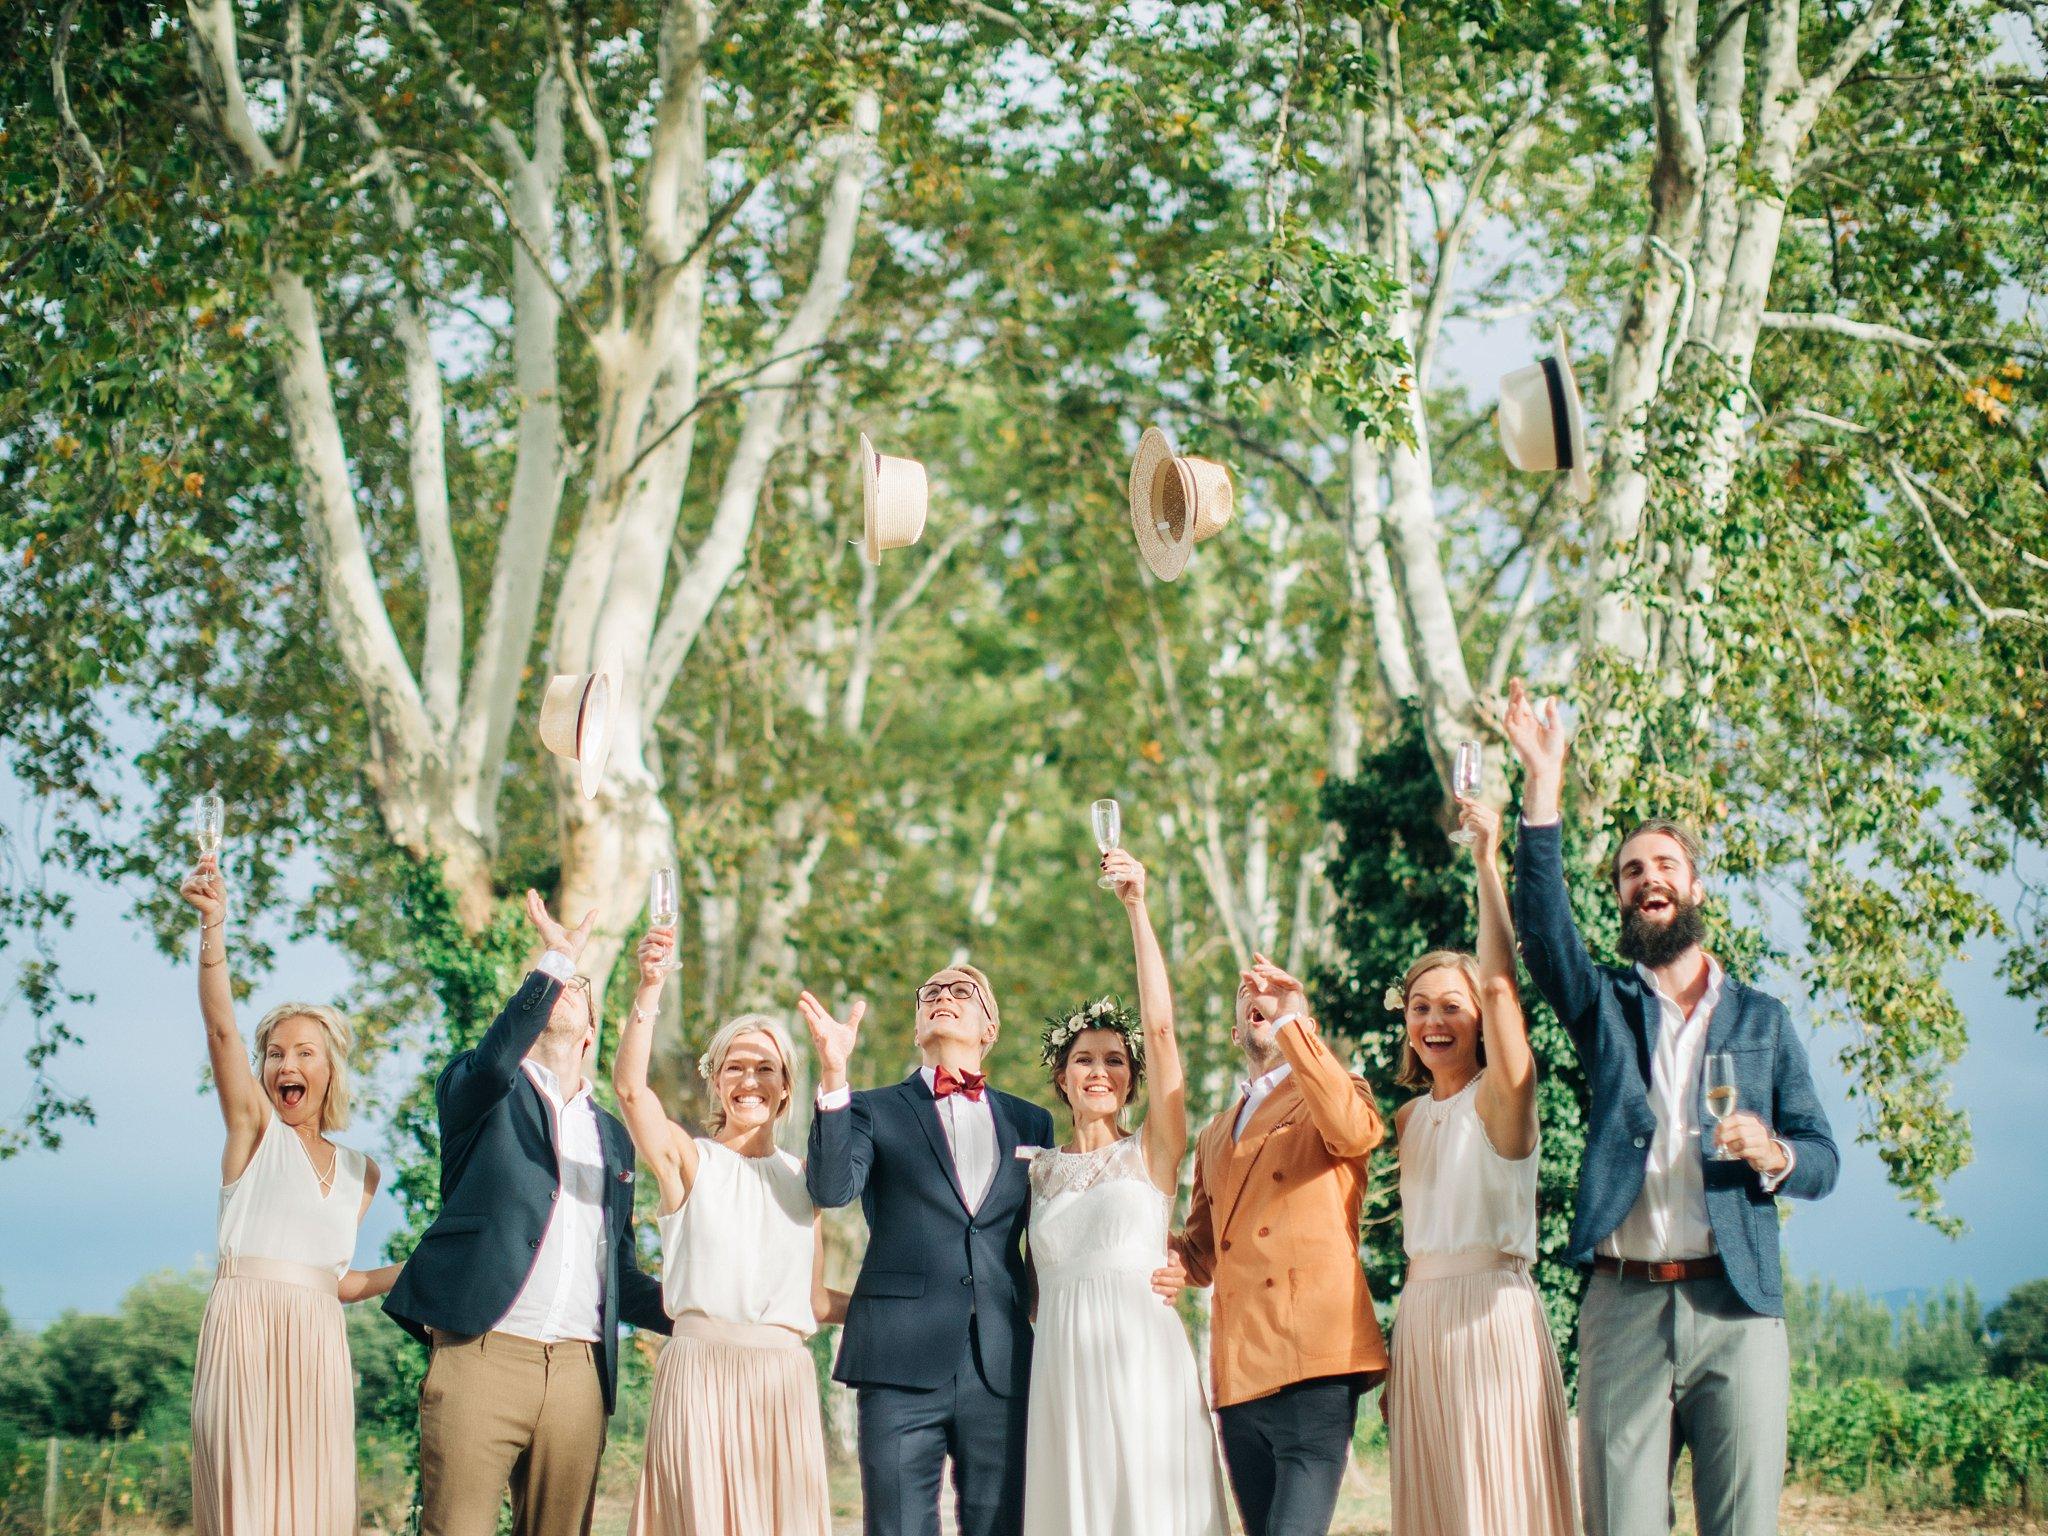 Wedding Photographer Perpignan - Château Las Collas Wedding - Hugo Hennequin088.jpg